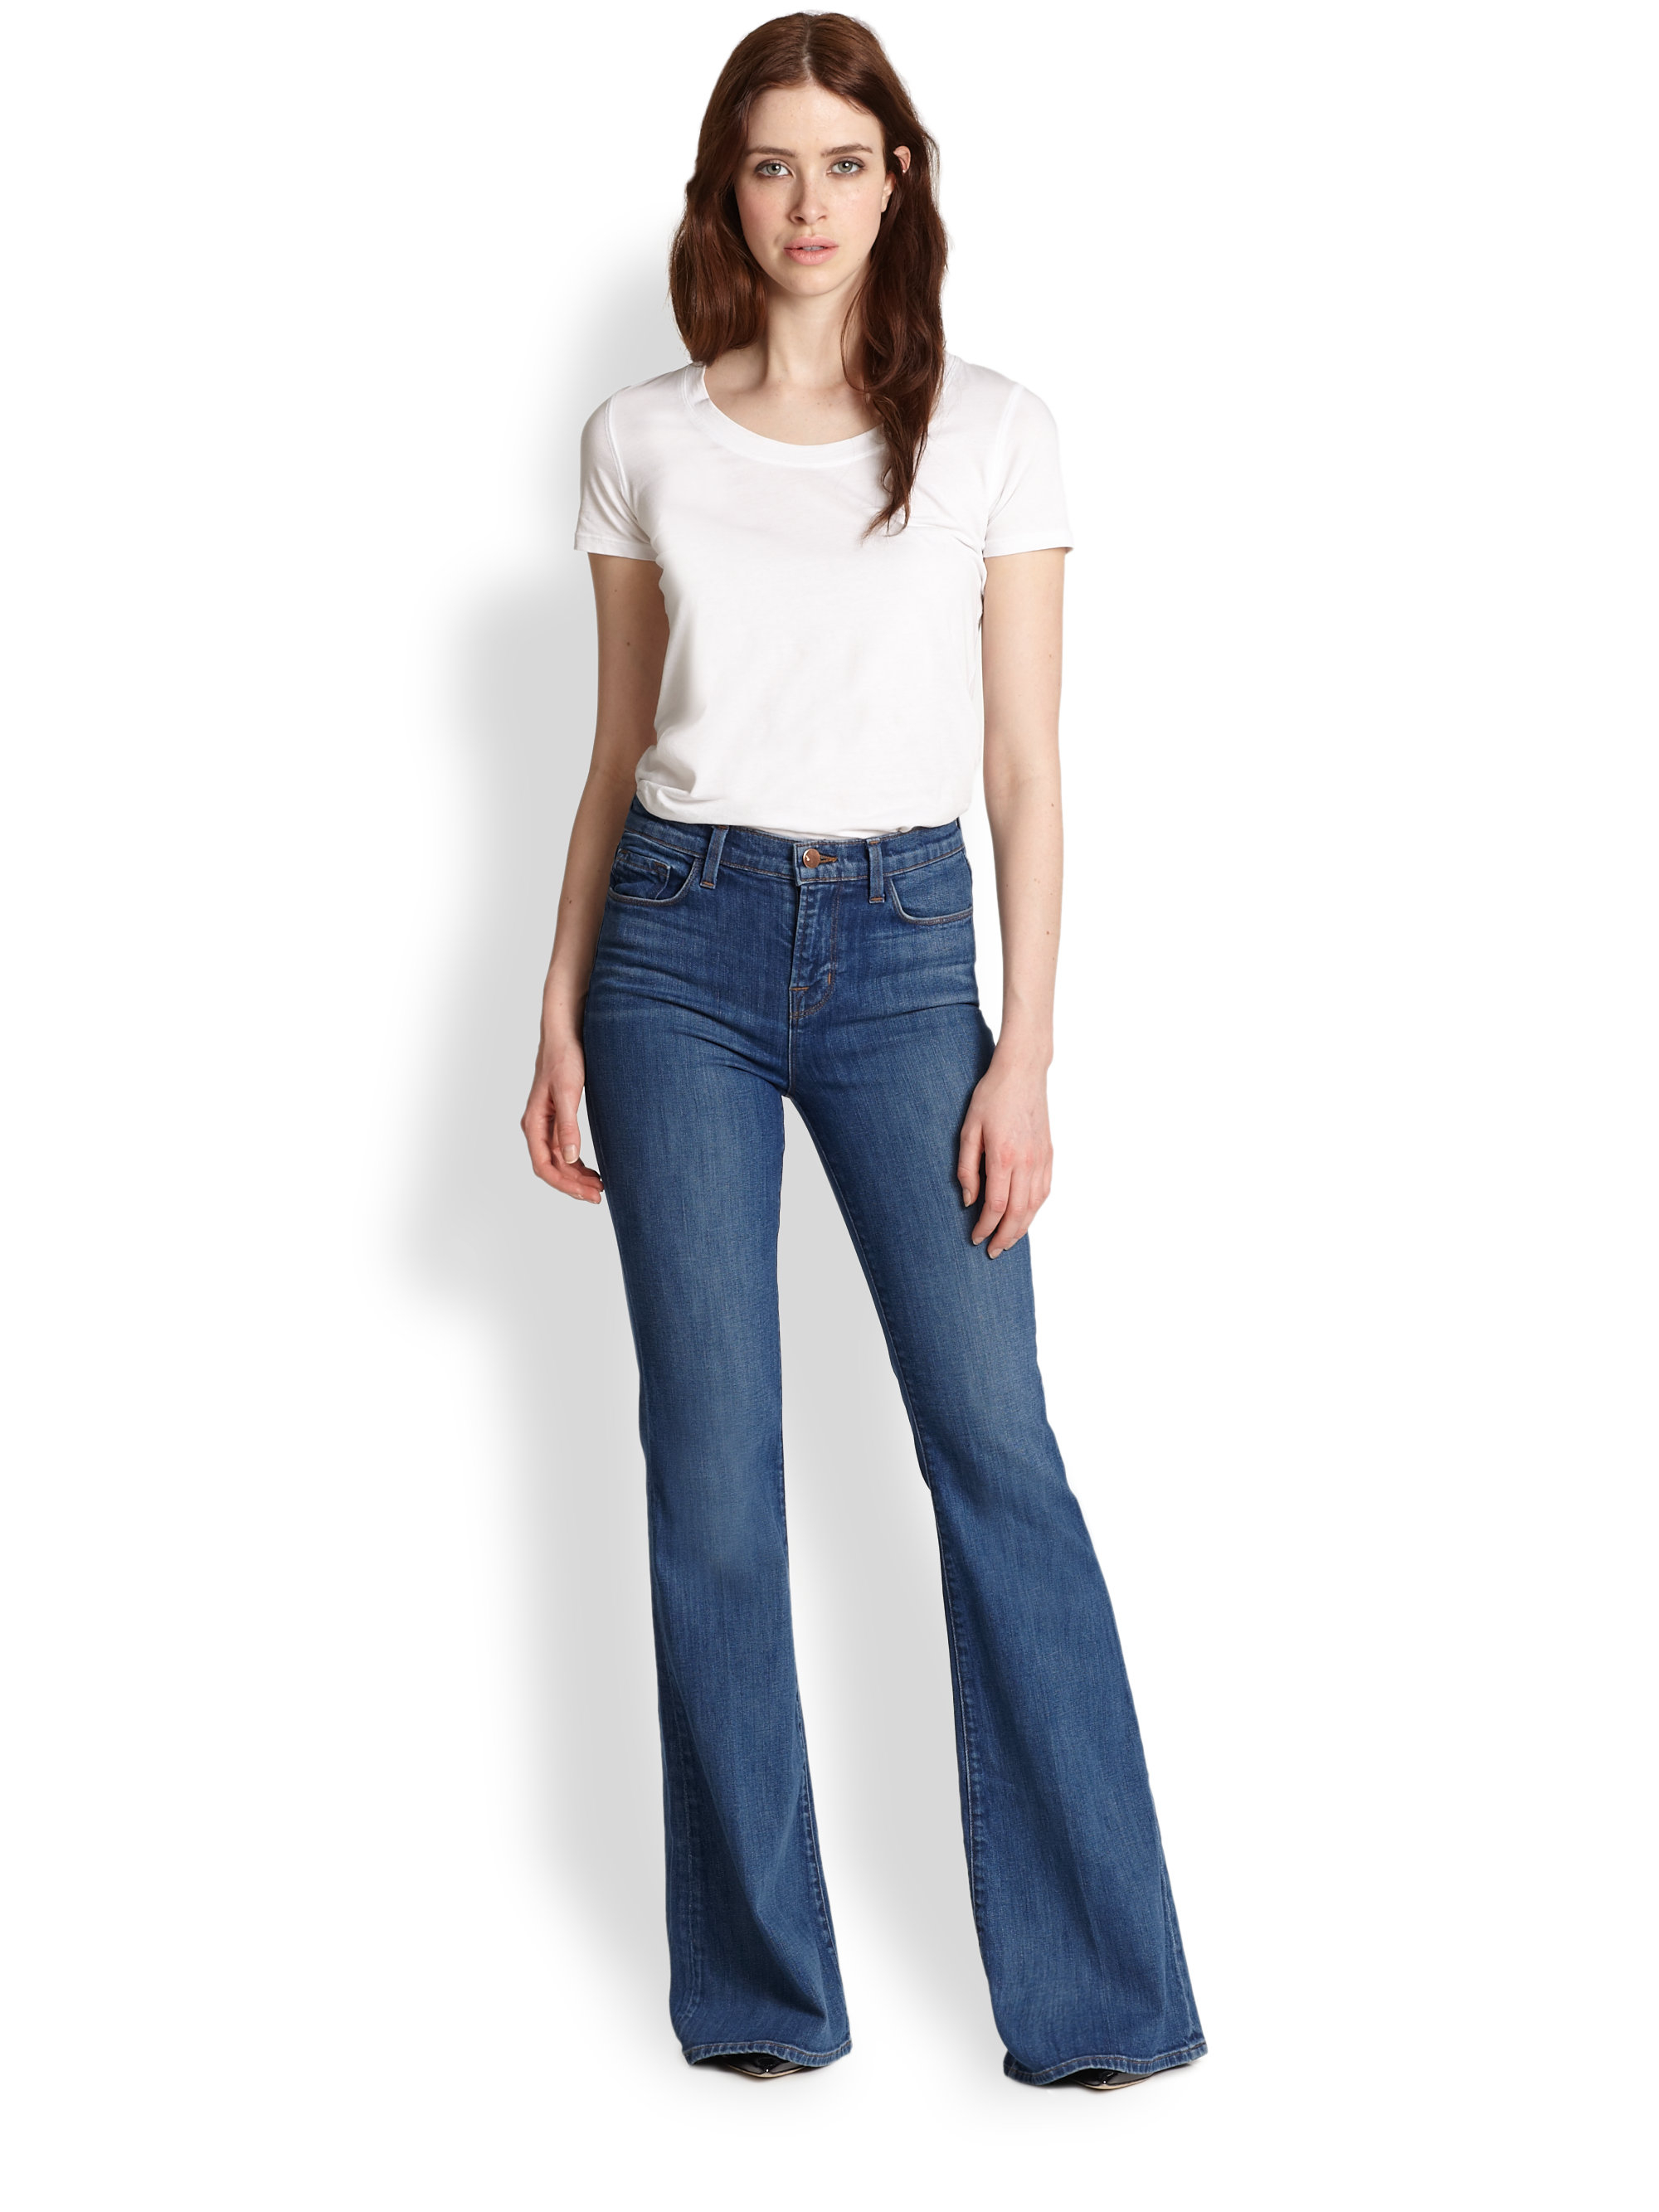 J brand Valentina High-Rise Flared Jeans in Blue | Lyst